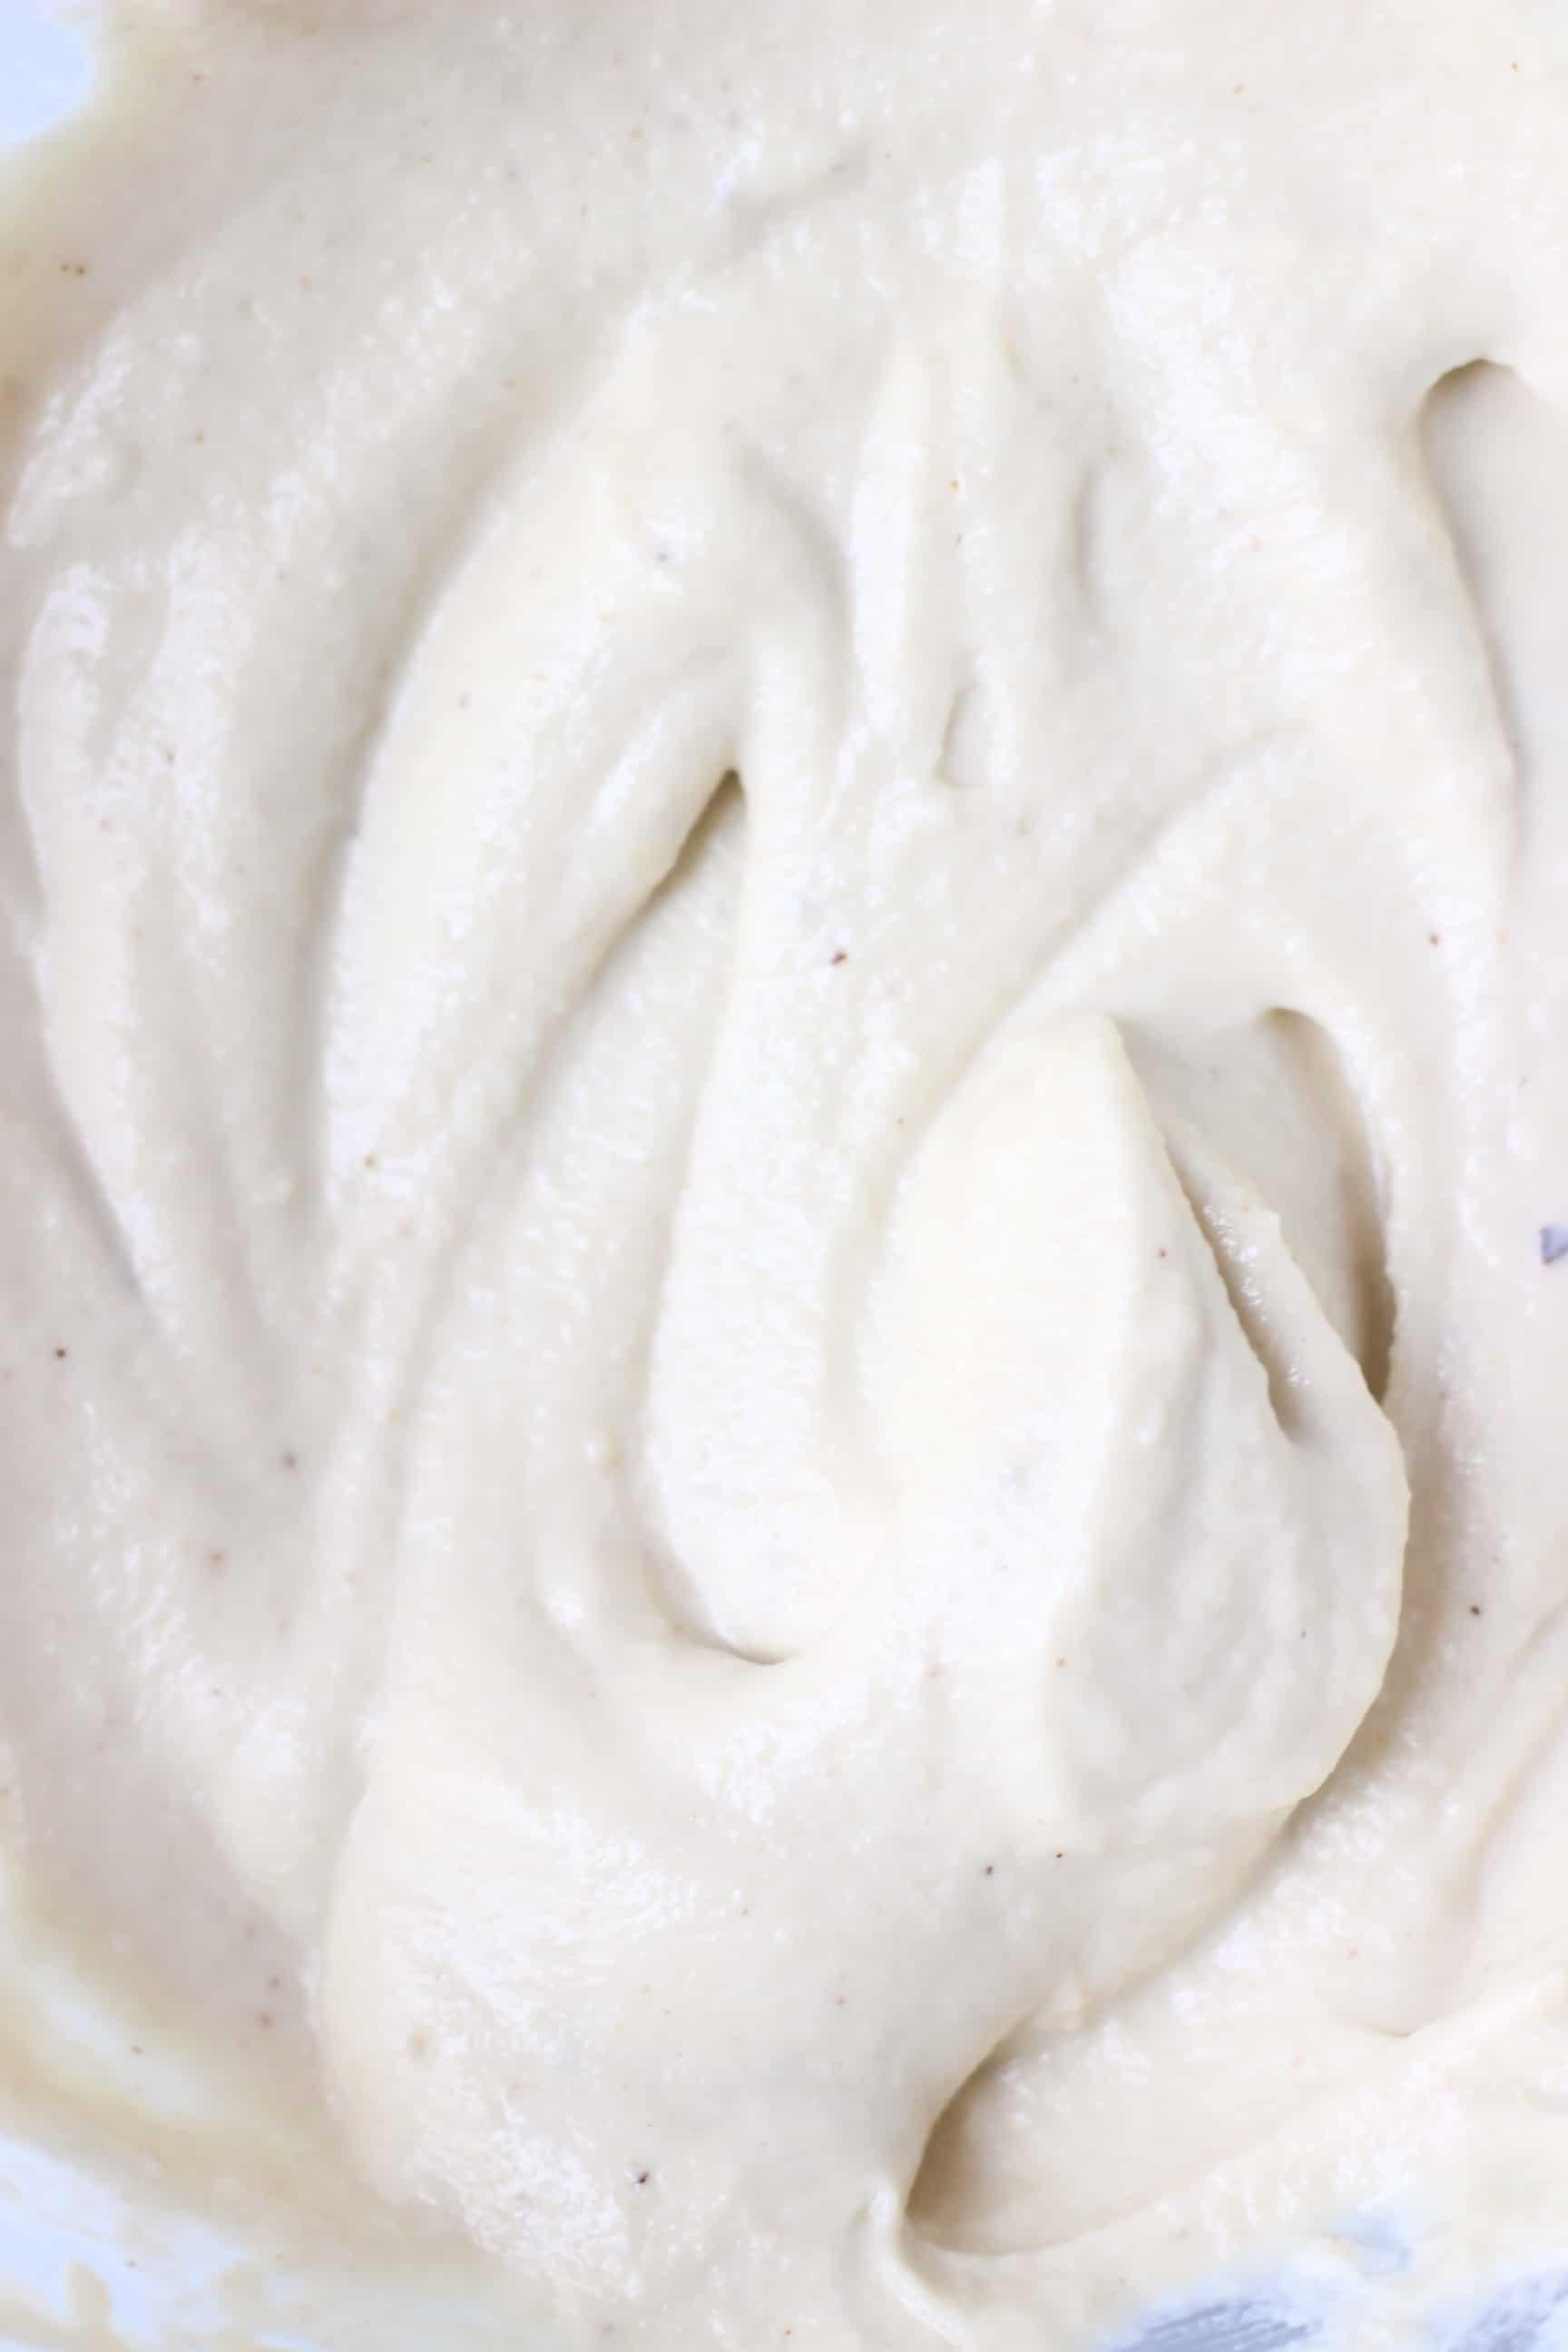 White cashew buttercream frosting